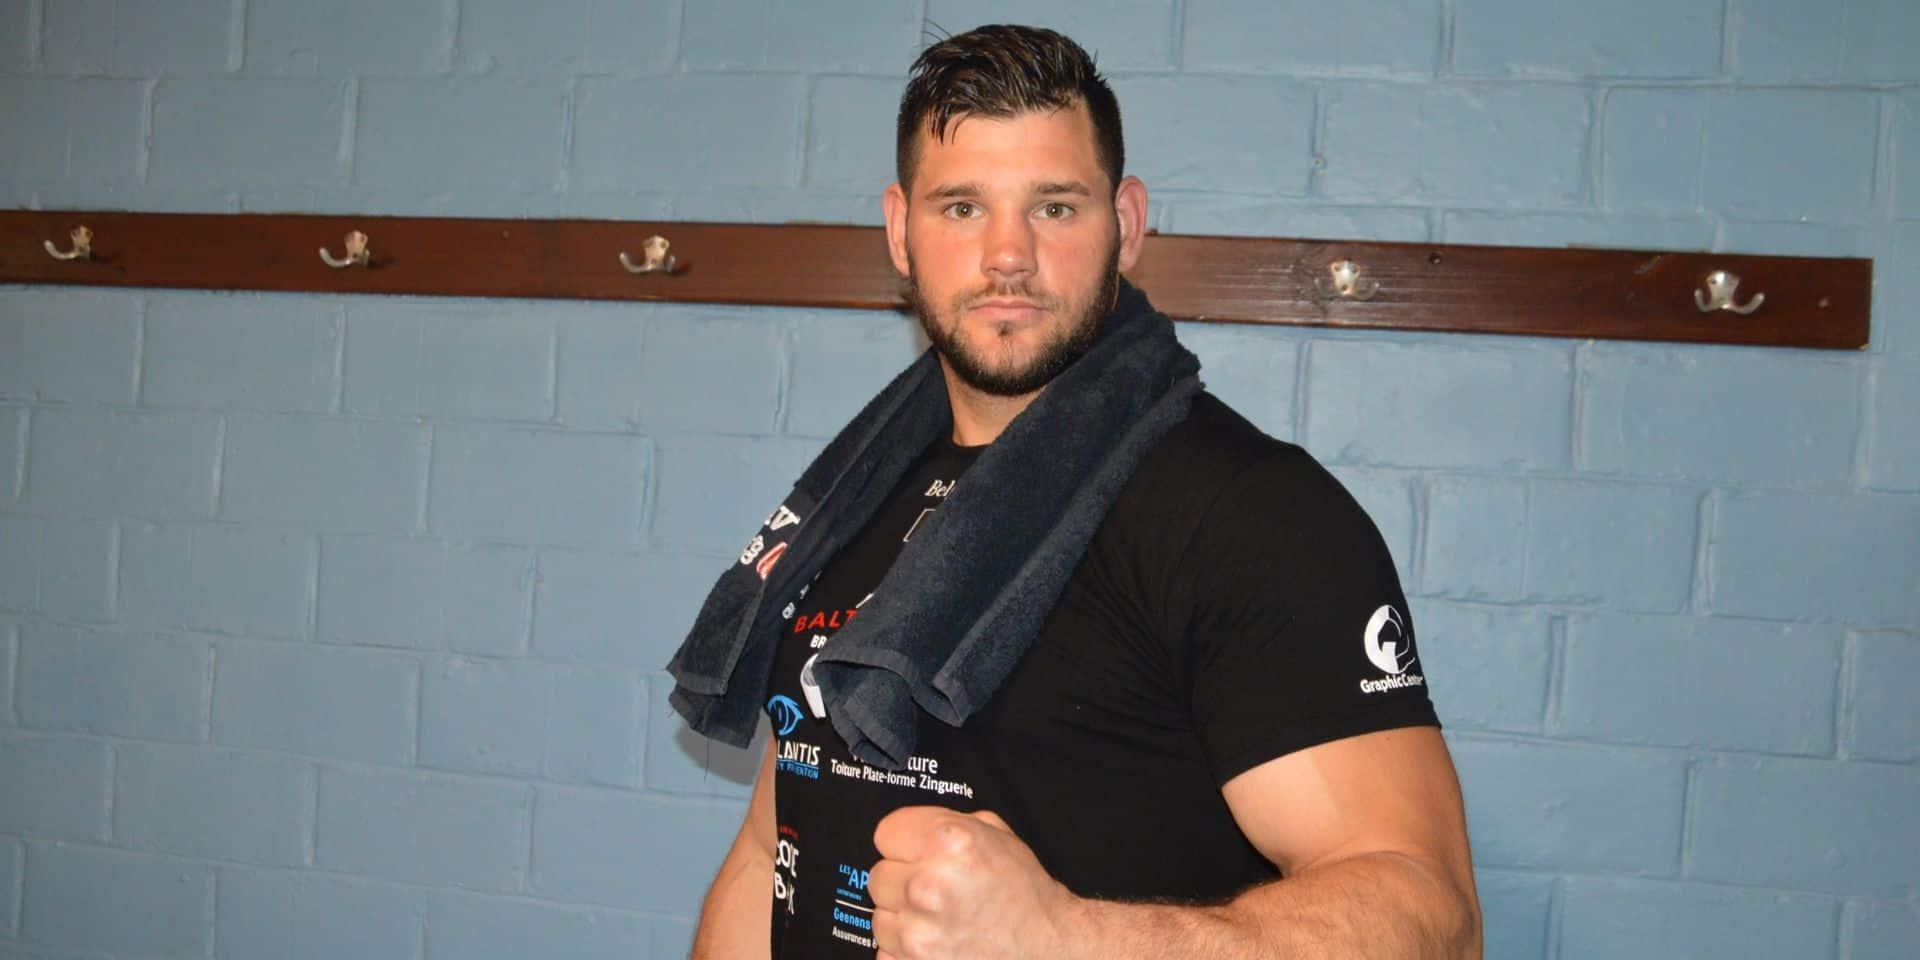 Boxe : Thomas Vanneste combattra bien ce samedi